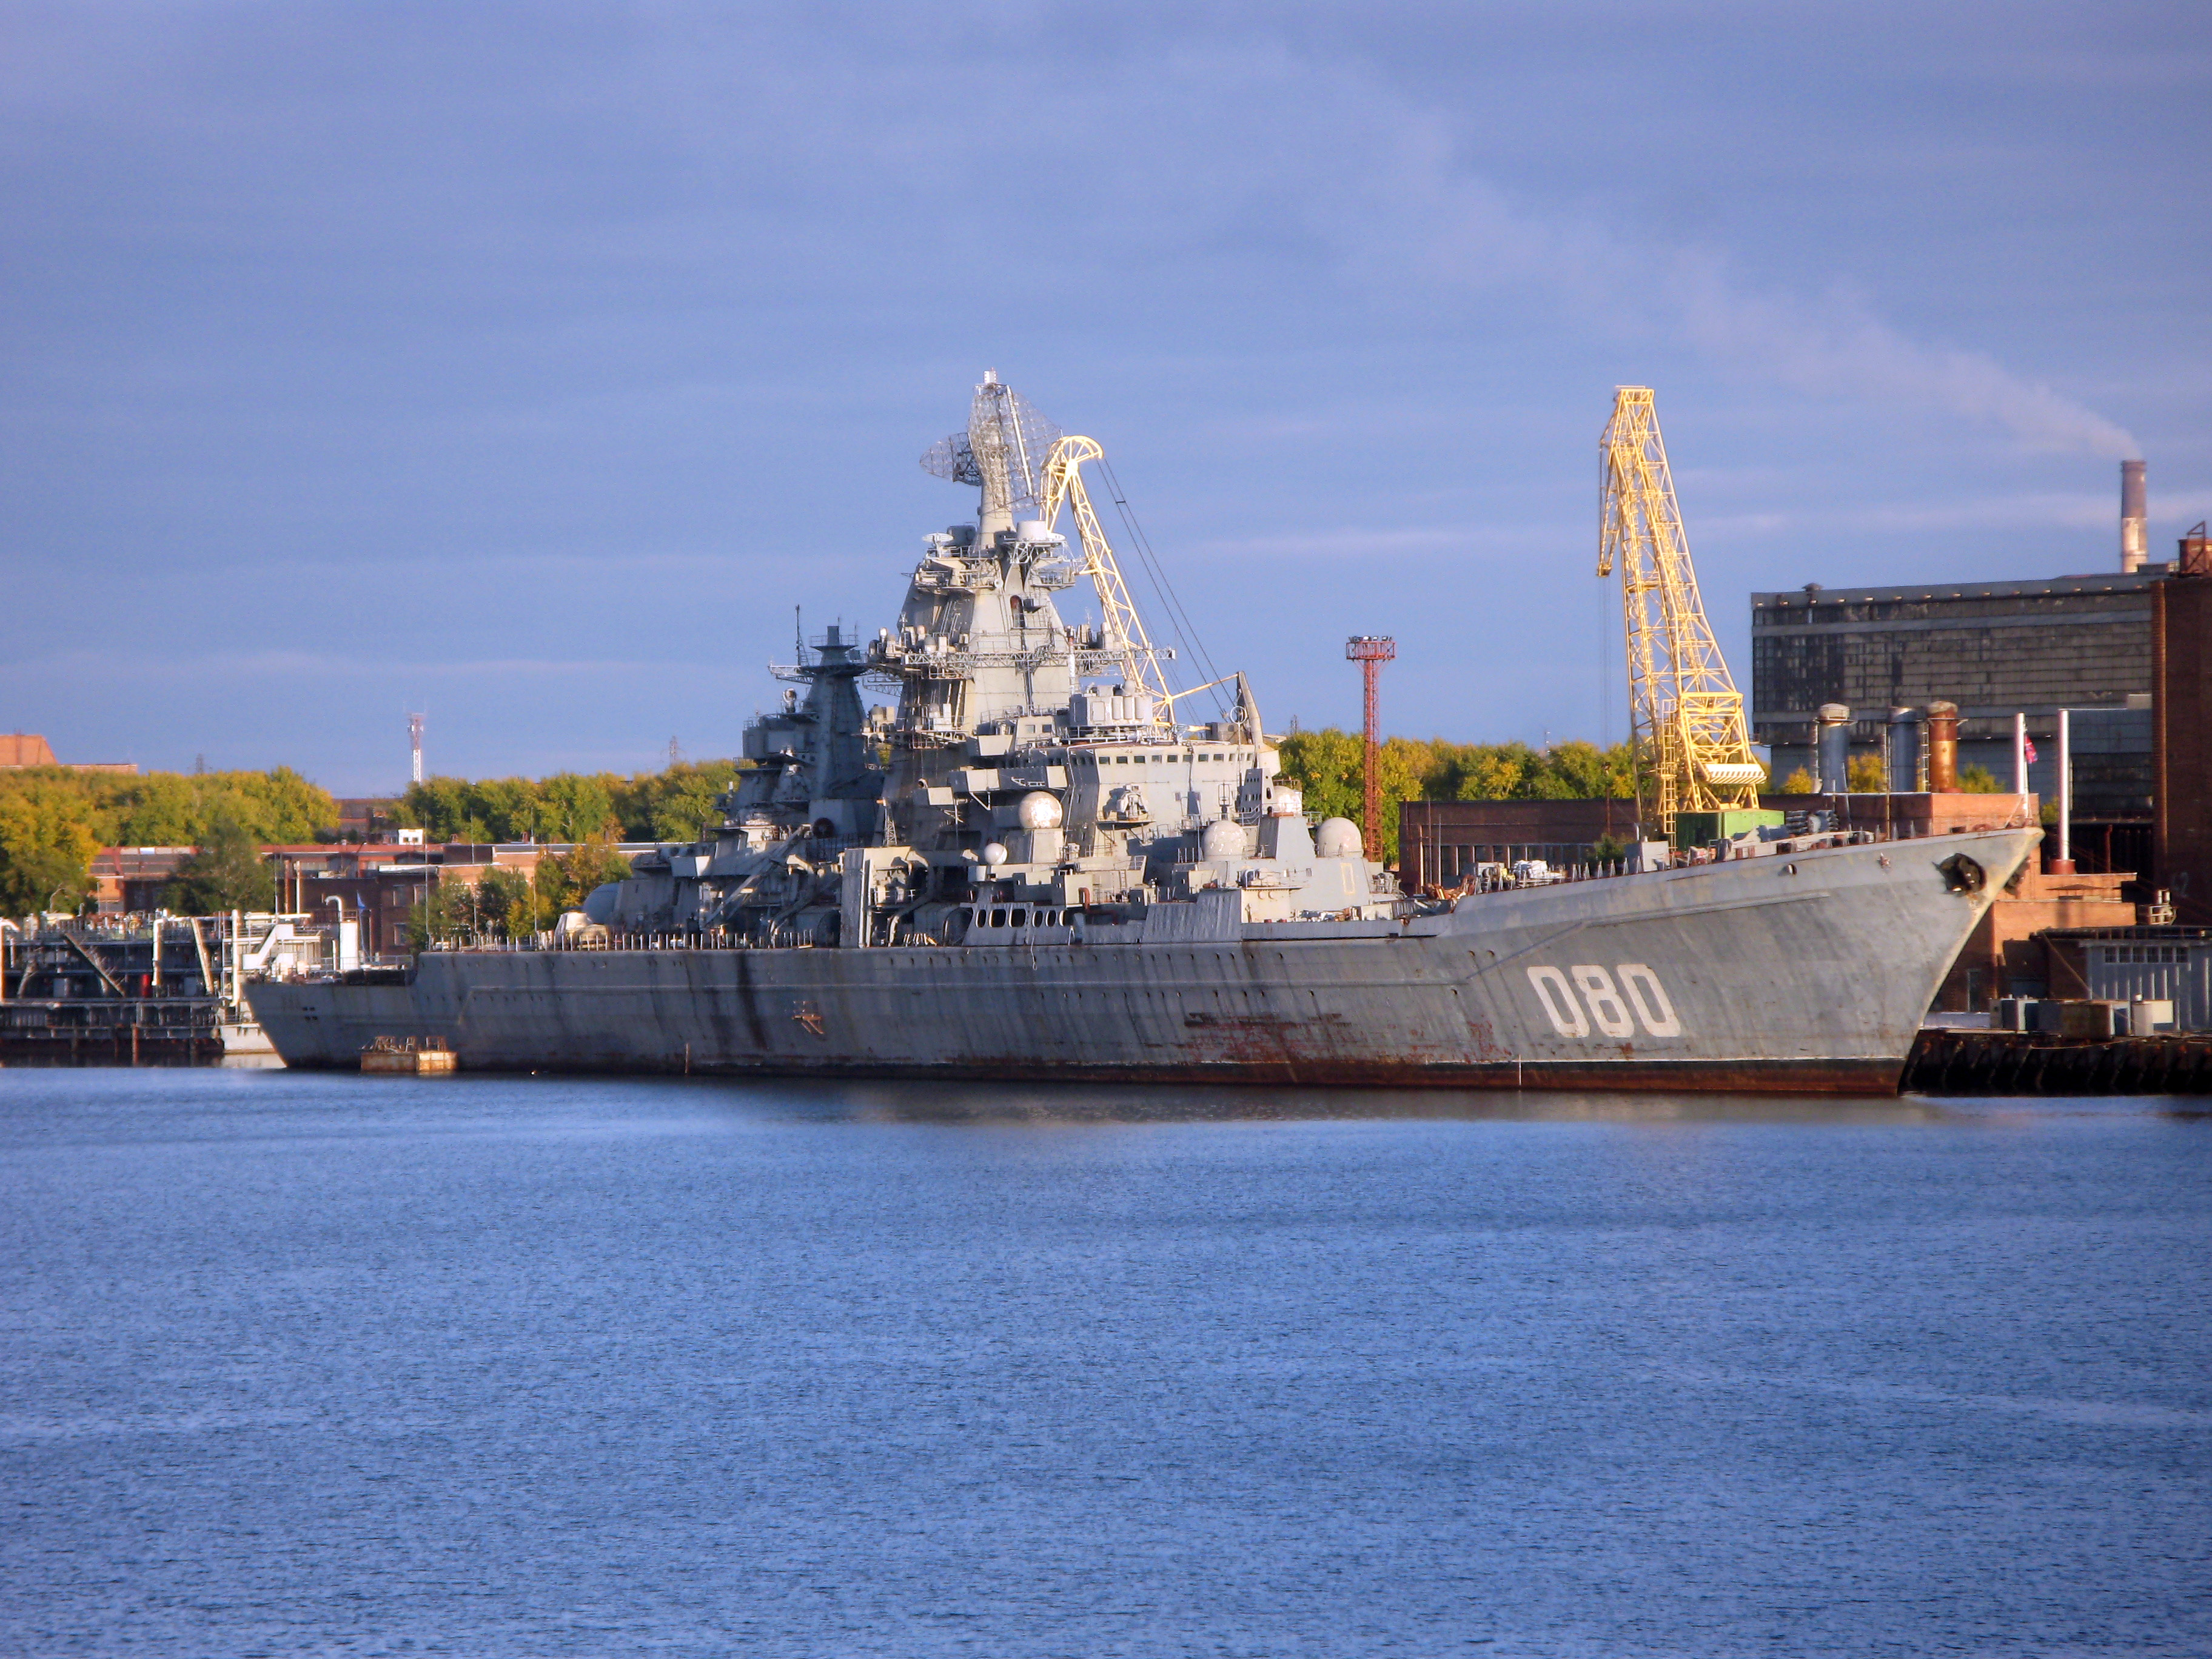 Ремонт адмирал нахимов крейсер фото